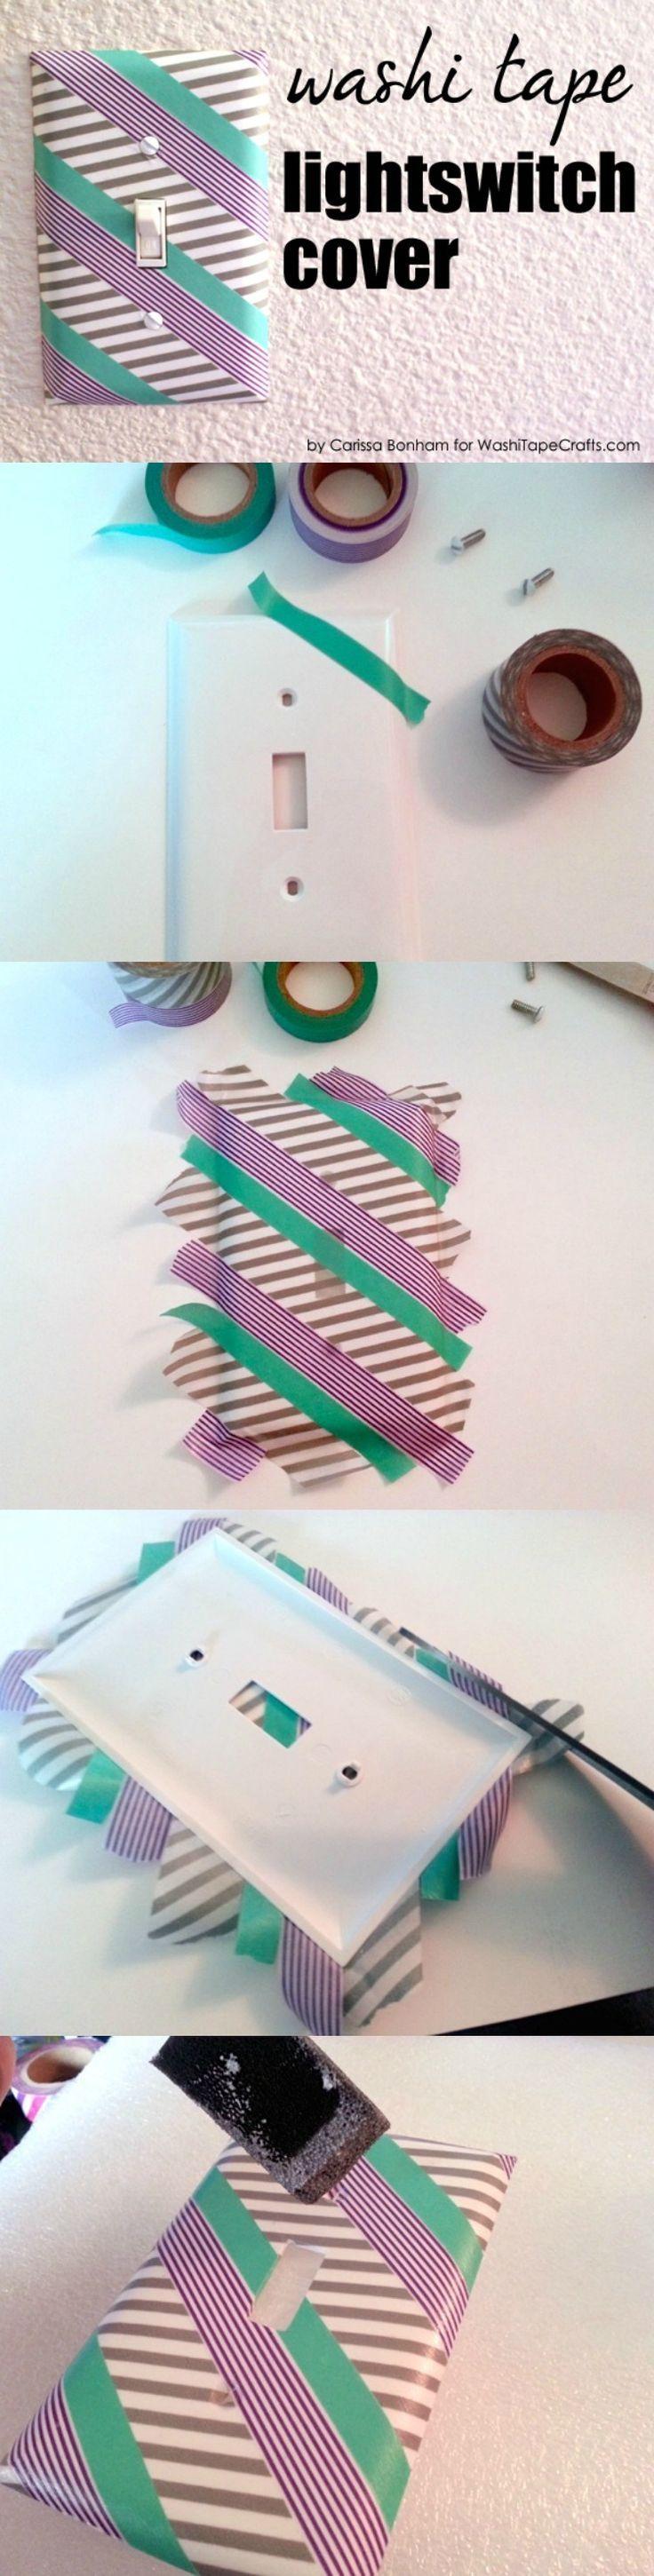 15 Fantastic Uses for Washi Tapes | Washi tape, Washi and Learning